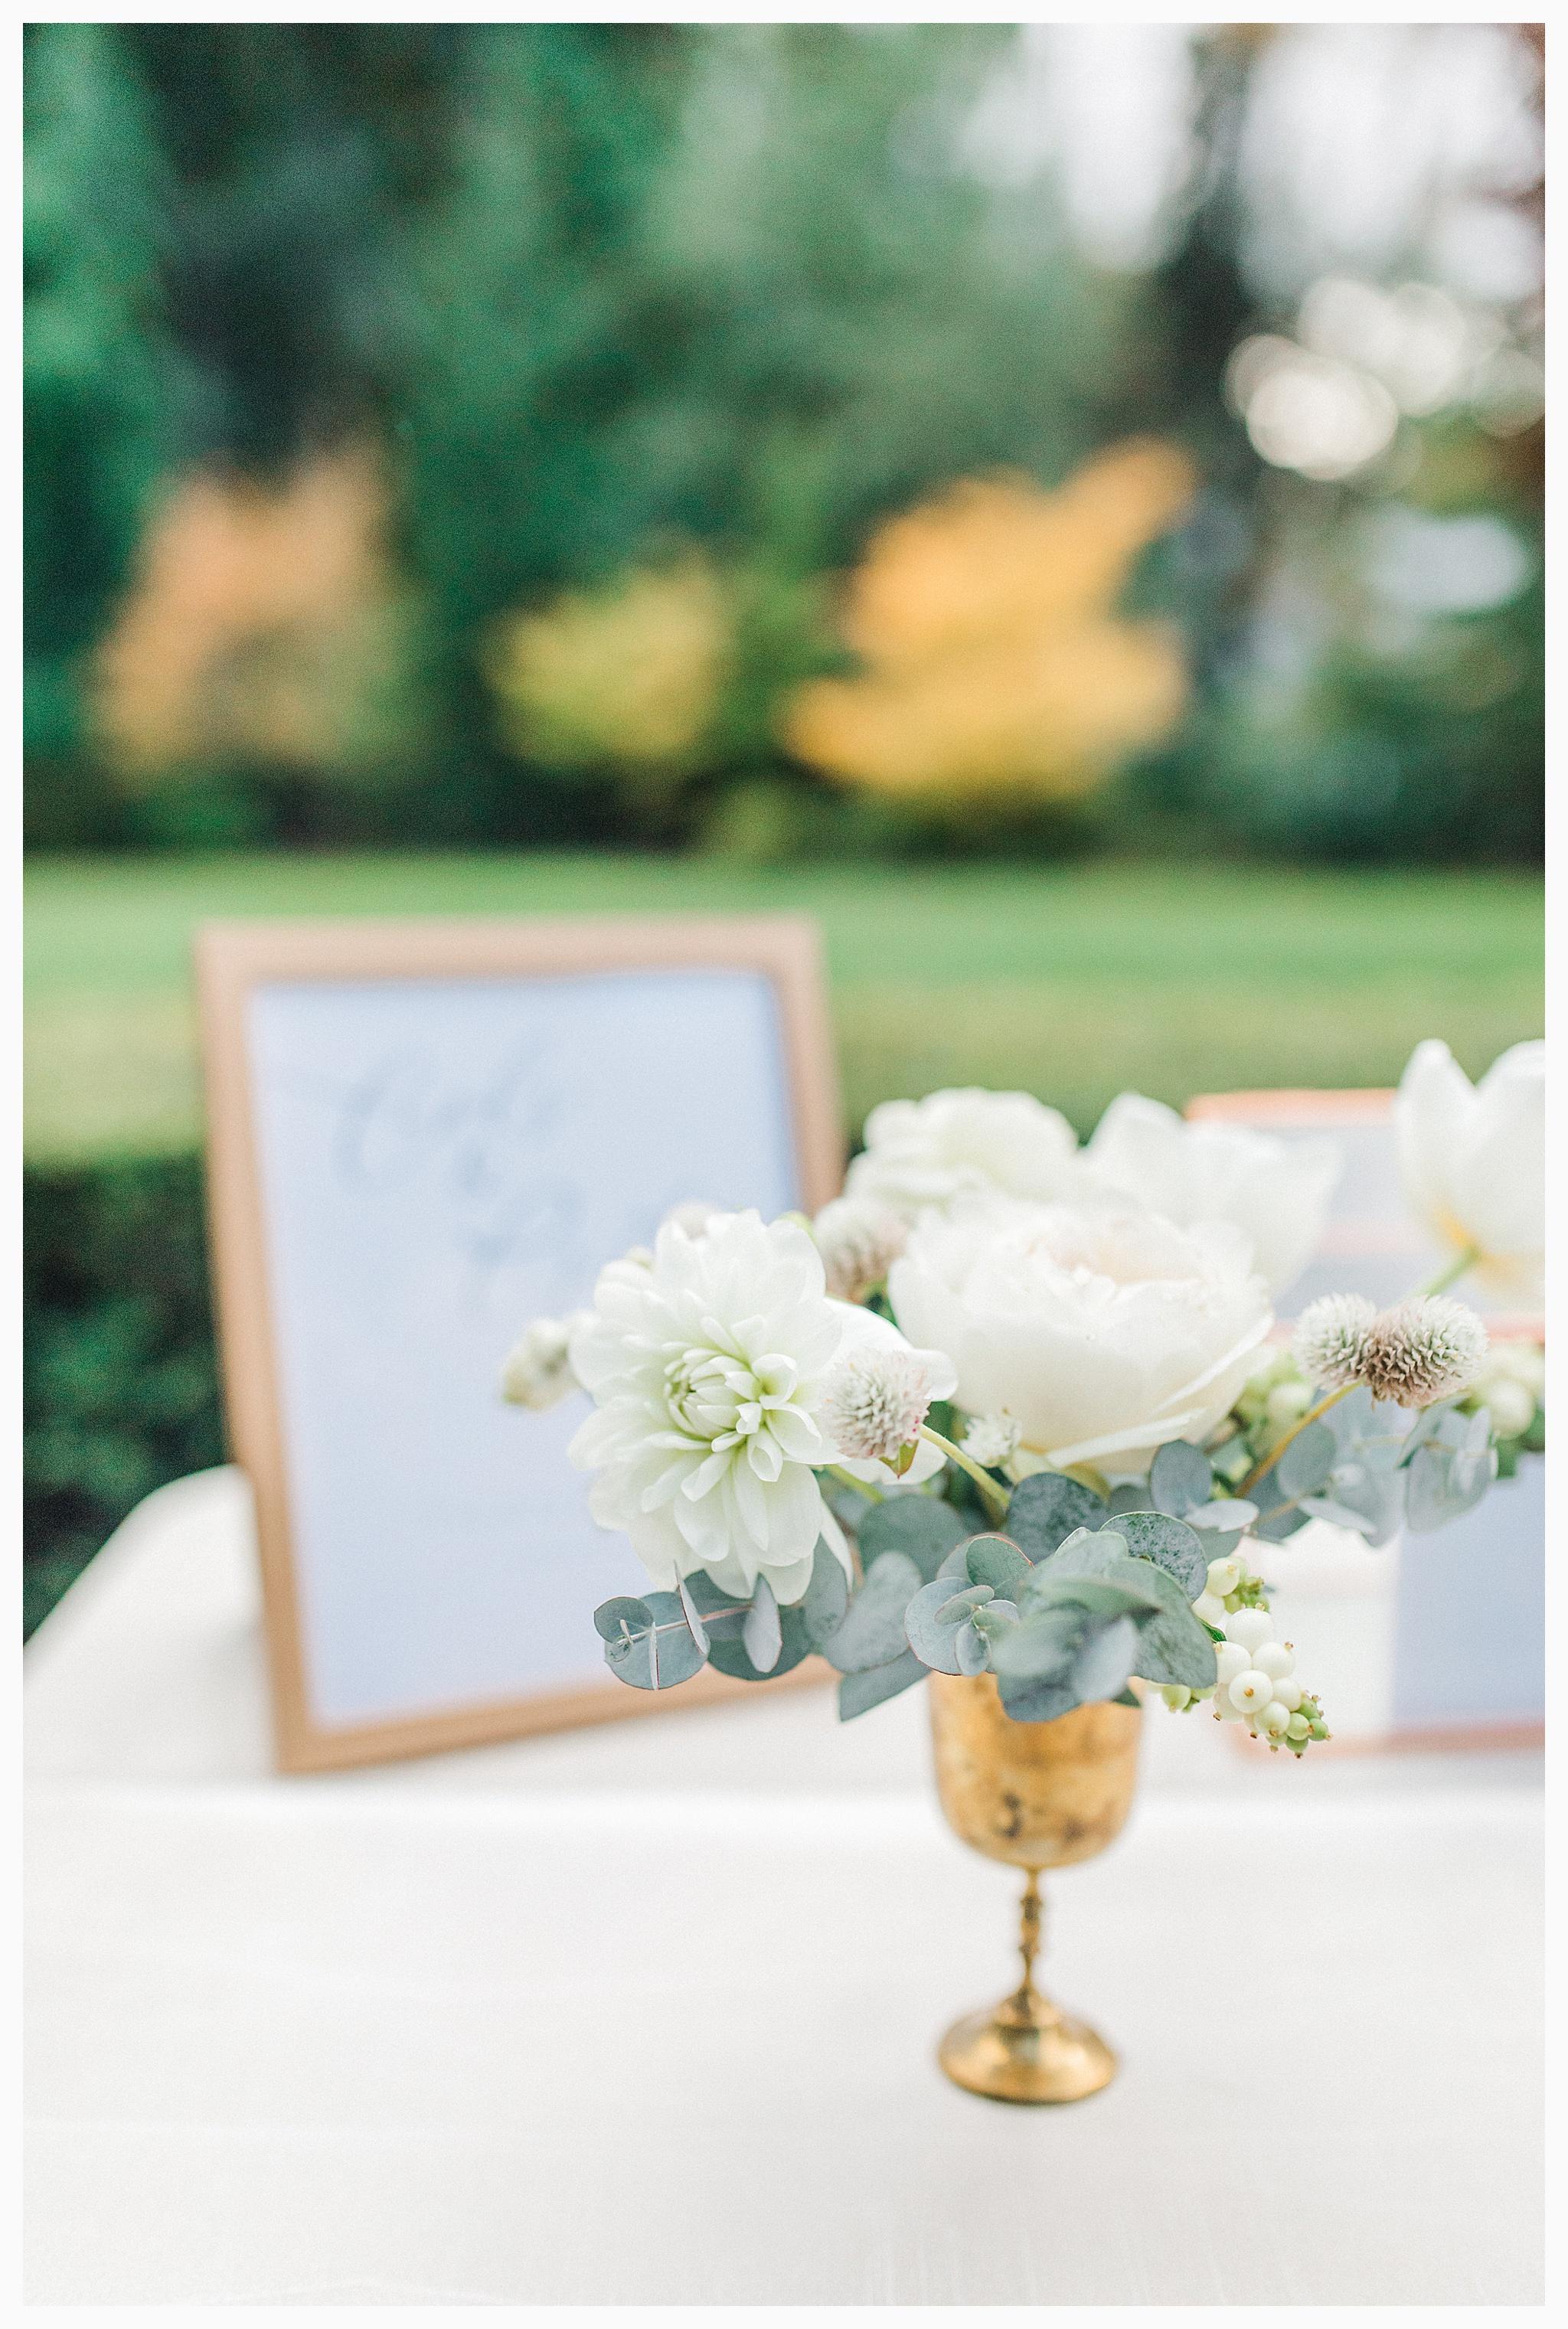 Emma Rose Company Light and Airy Wedding Photographer, Beautiful fall wedding at Rock Creek Gardens Venue in Puyallup, Washington._0066.jpg